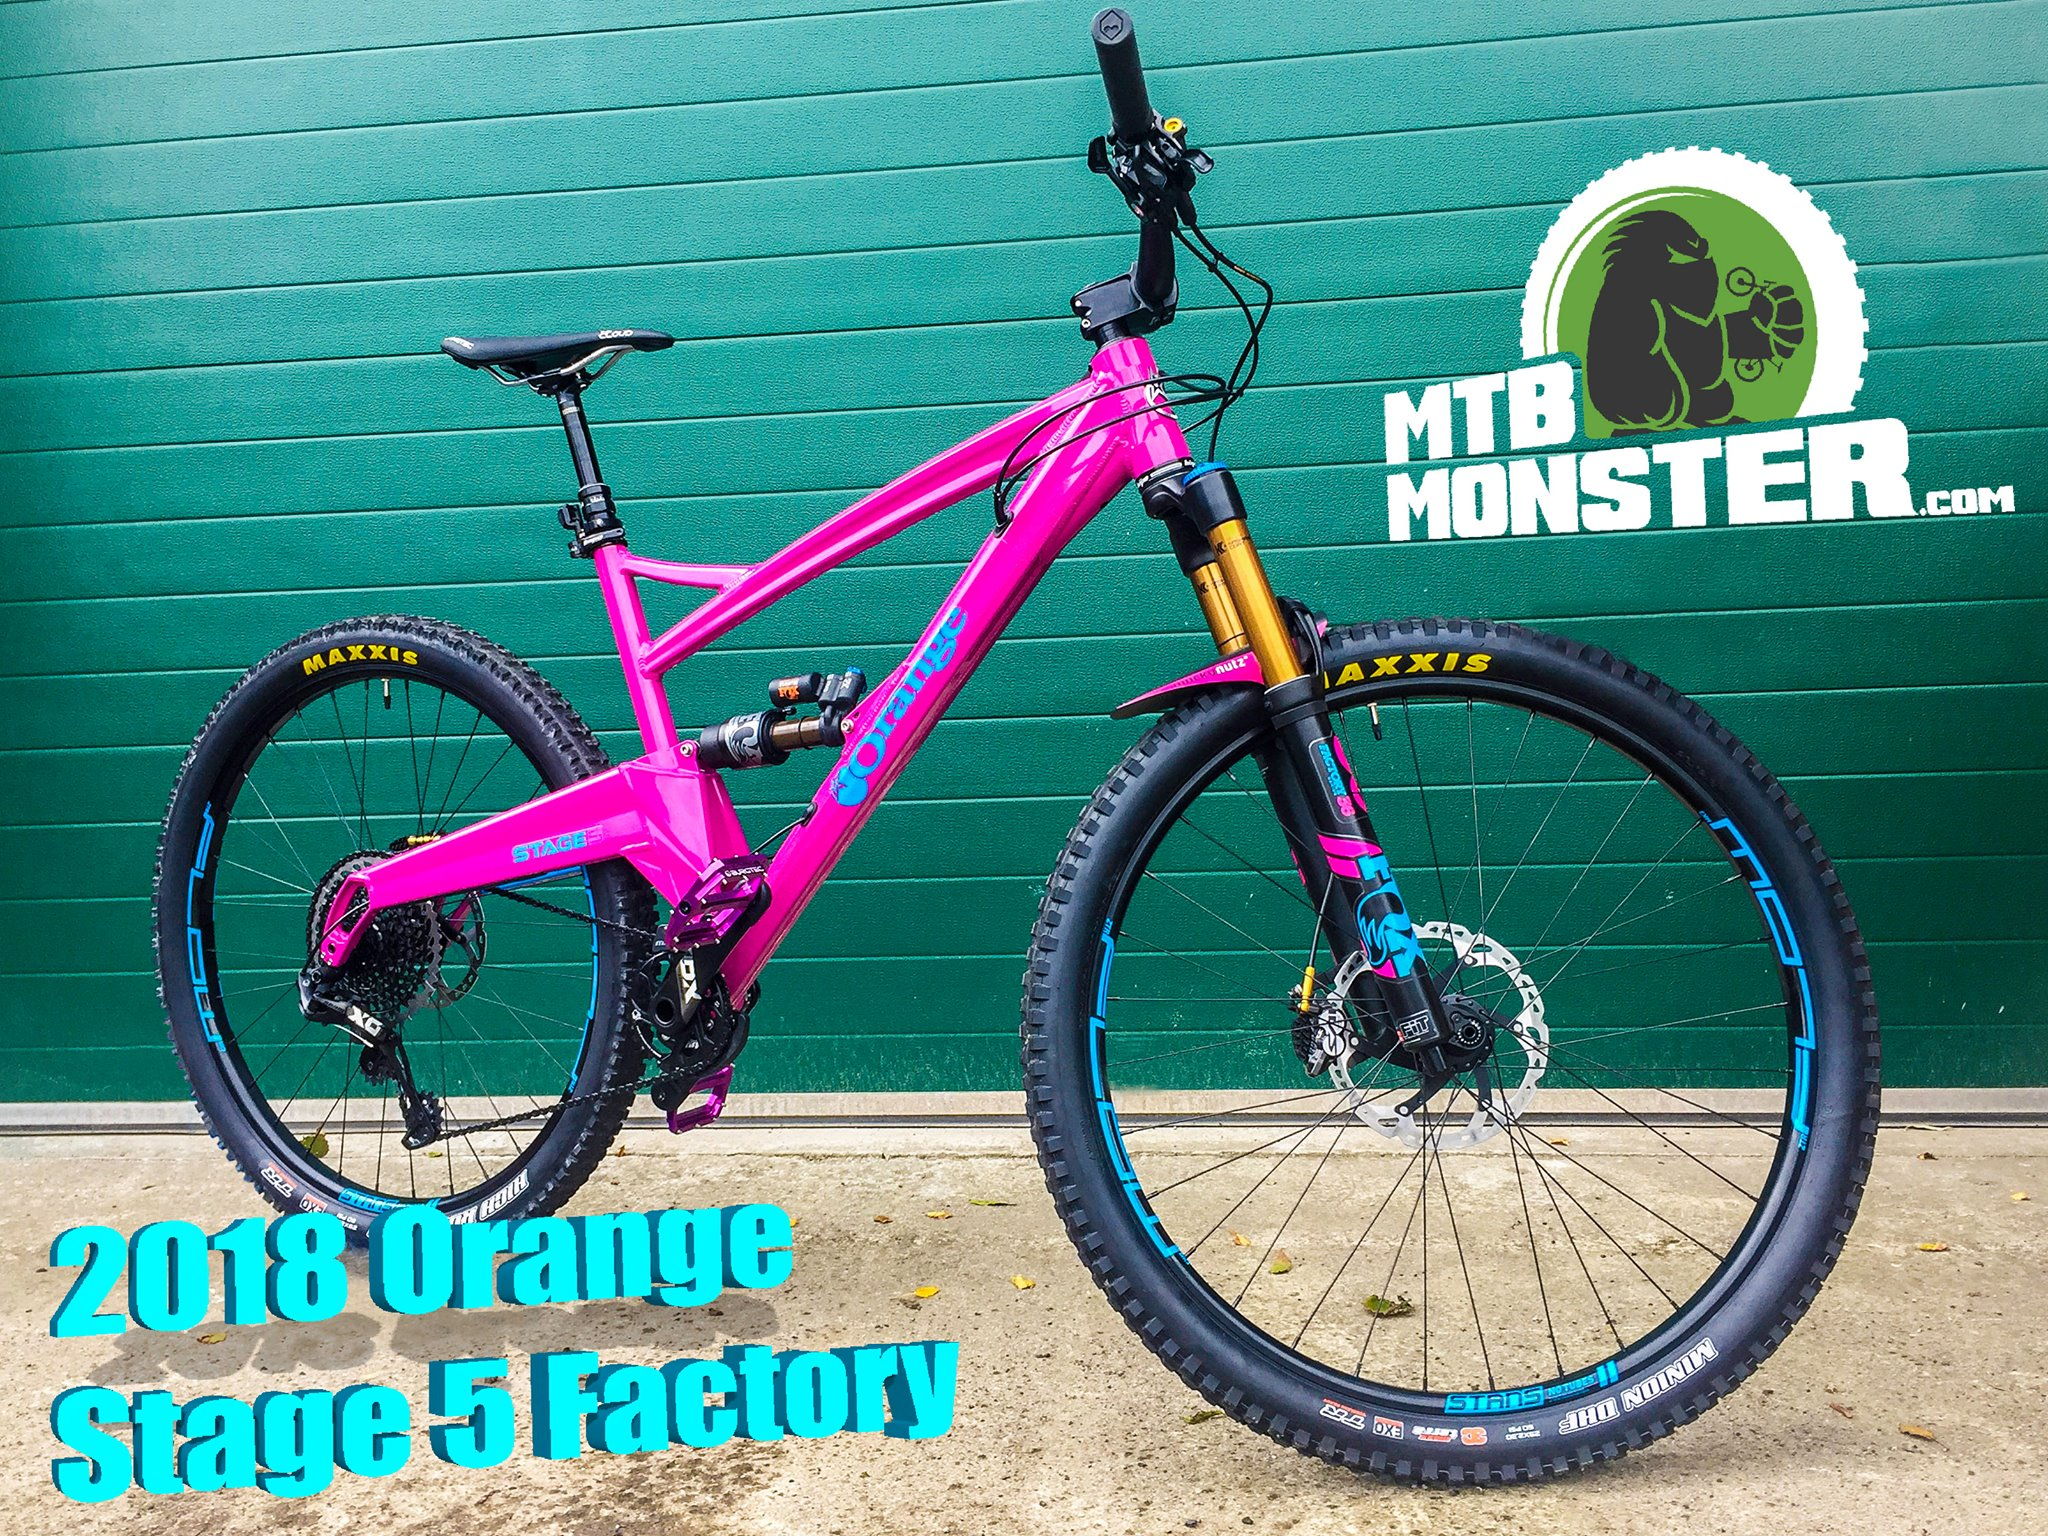 Orange Bikes Stage 5 Factory Custom Build